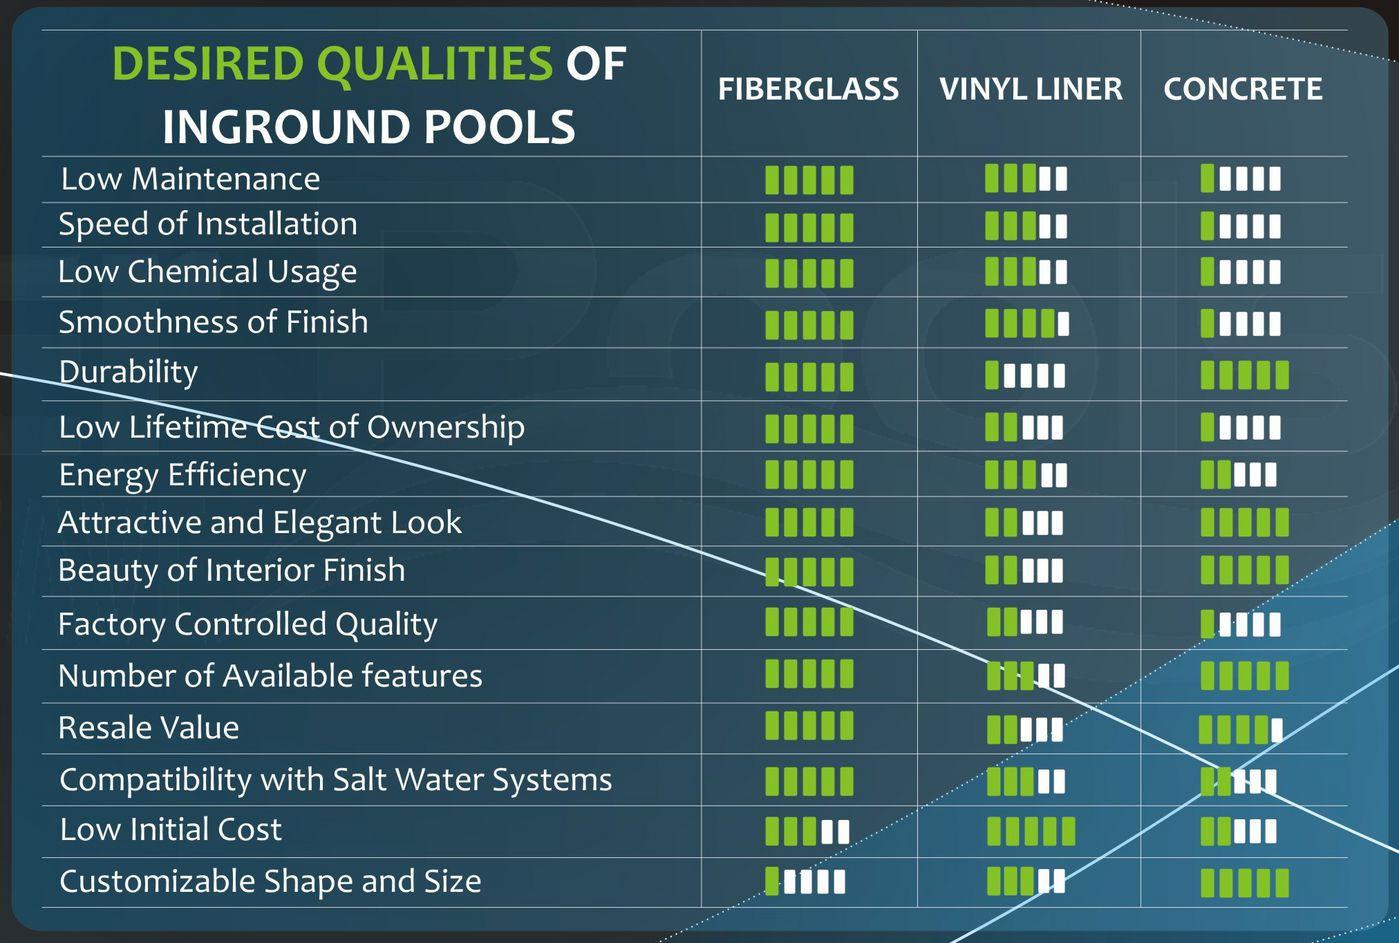 Fiberglass Pools vs Concrete Pools vs Vinyl Liner Pools Which is